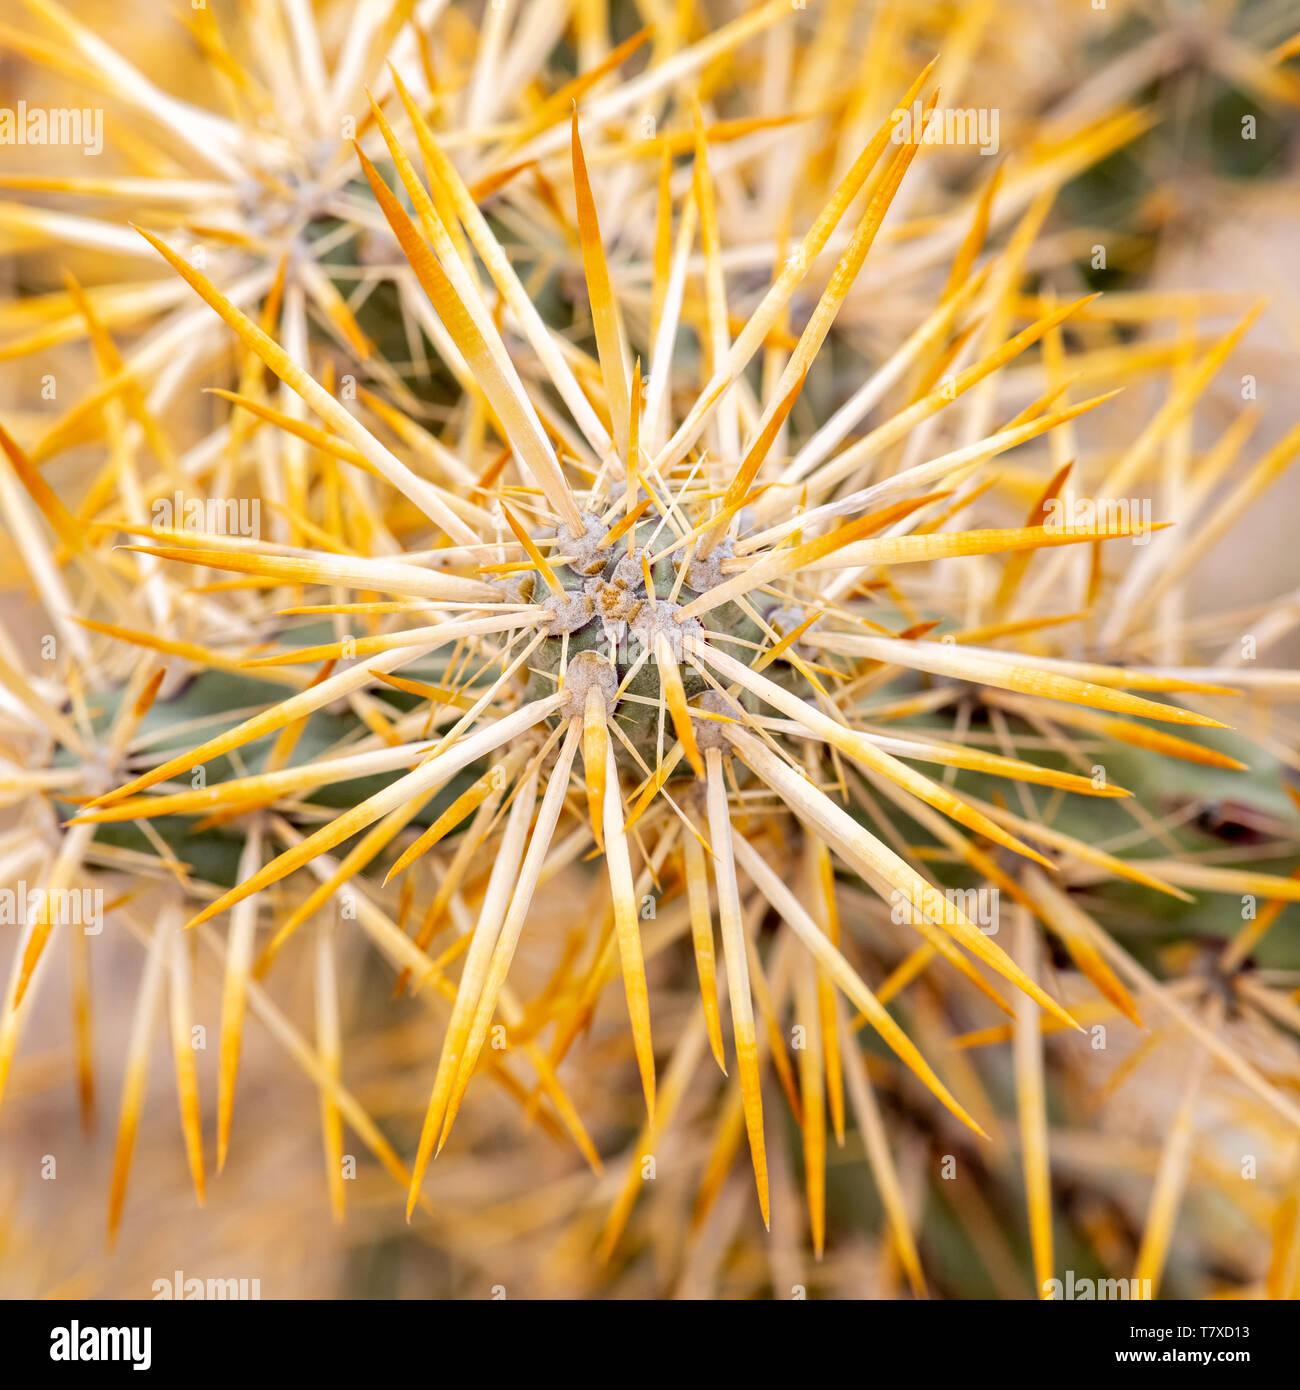 Jumping cholla (Cylindropuntia fulgida) cactus in the desert near Bahia de los Angeles,  Baja California Sur, Mexico. Stock Photo